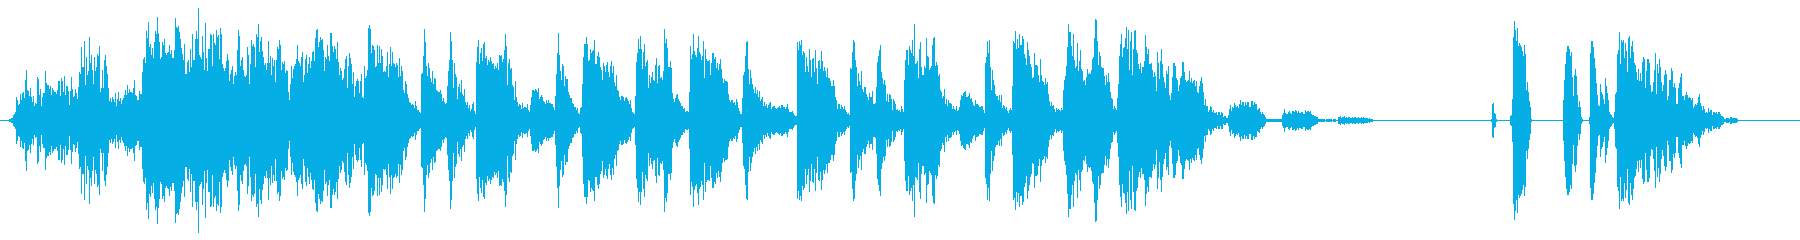 BOP BEDの再生済みの波形